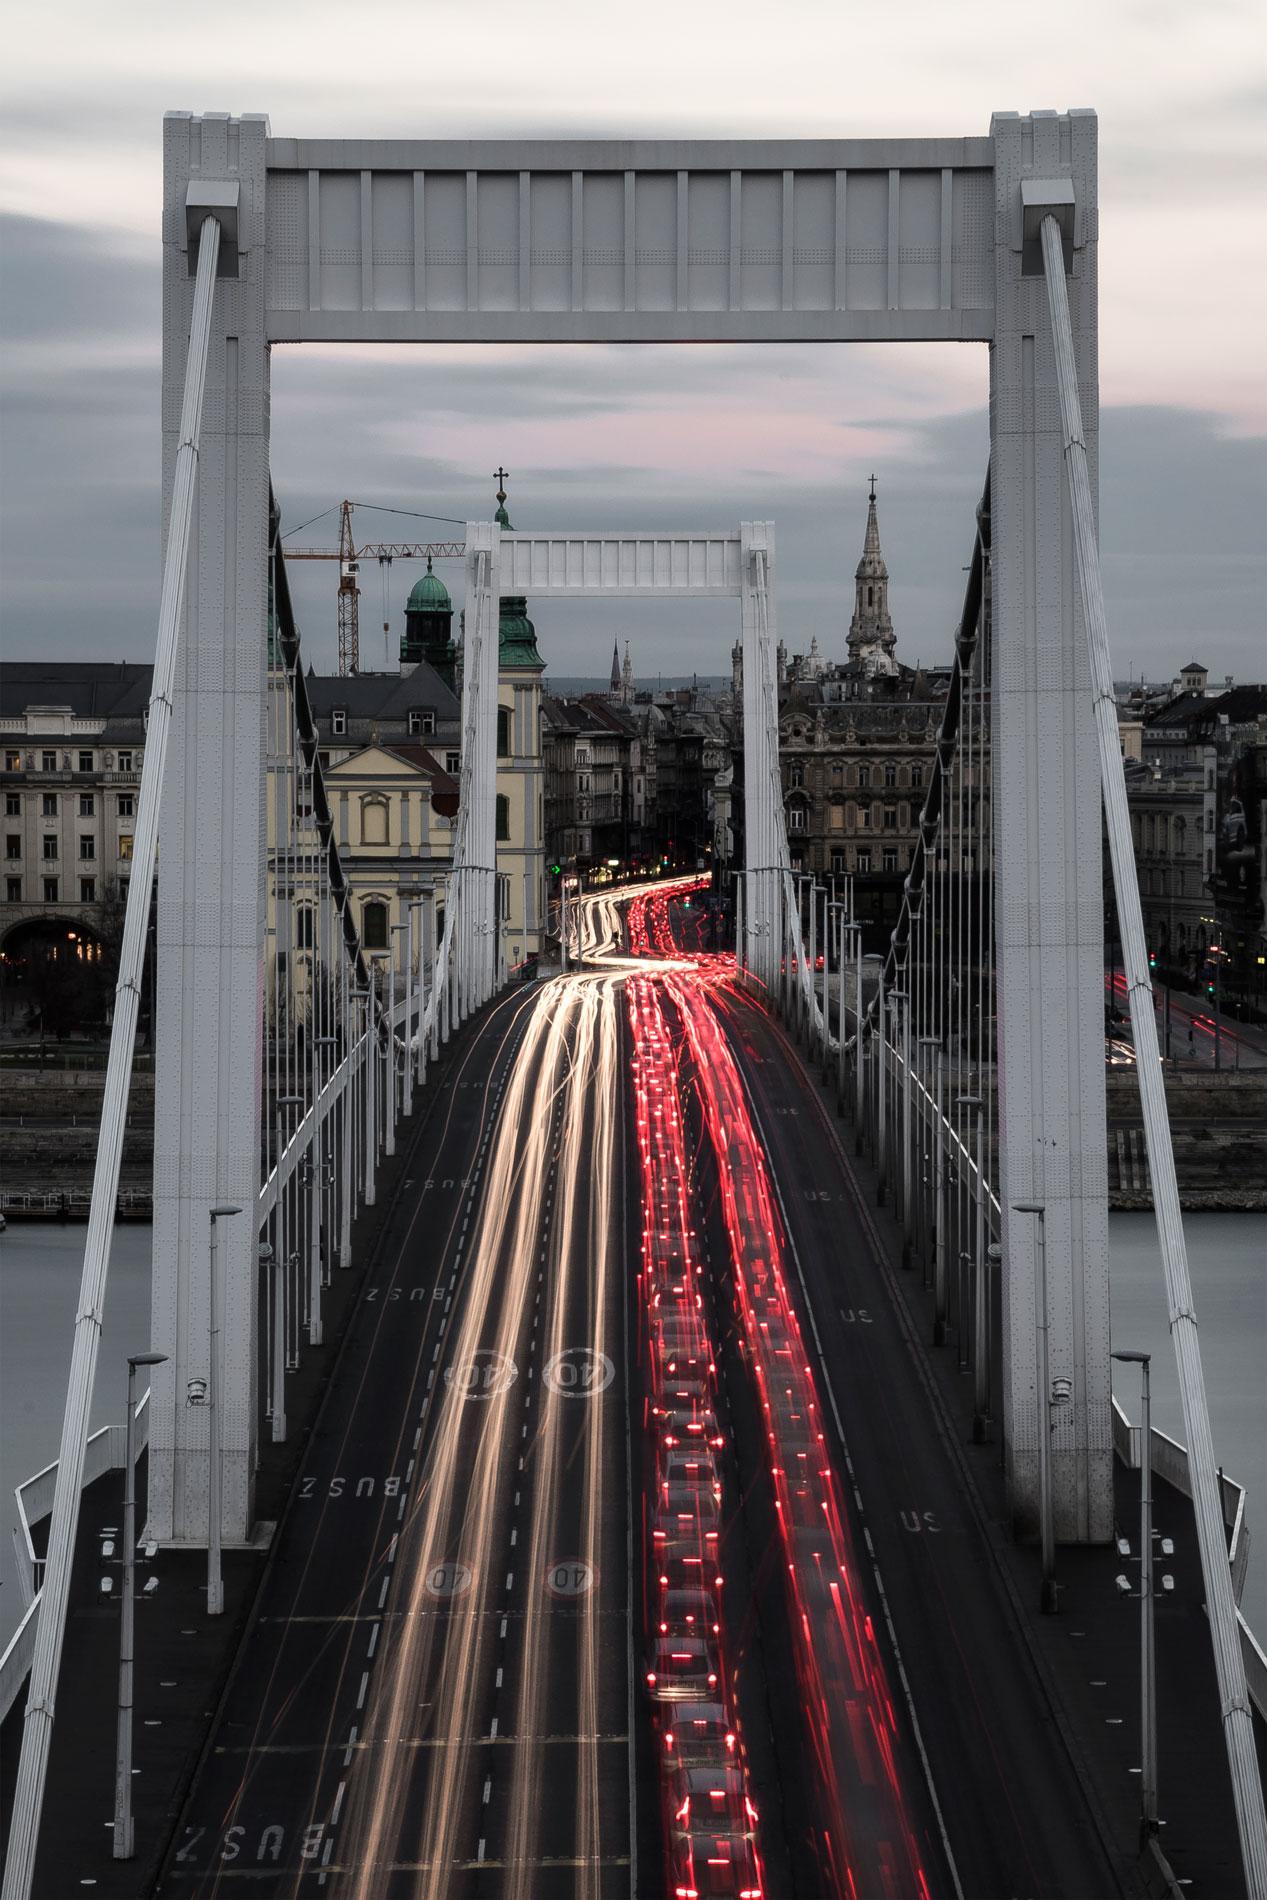 budapest_atthary_photography_bridge_34